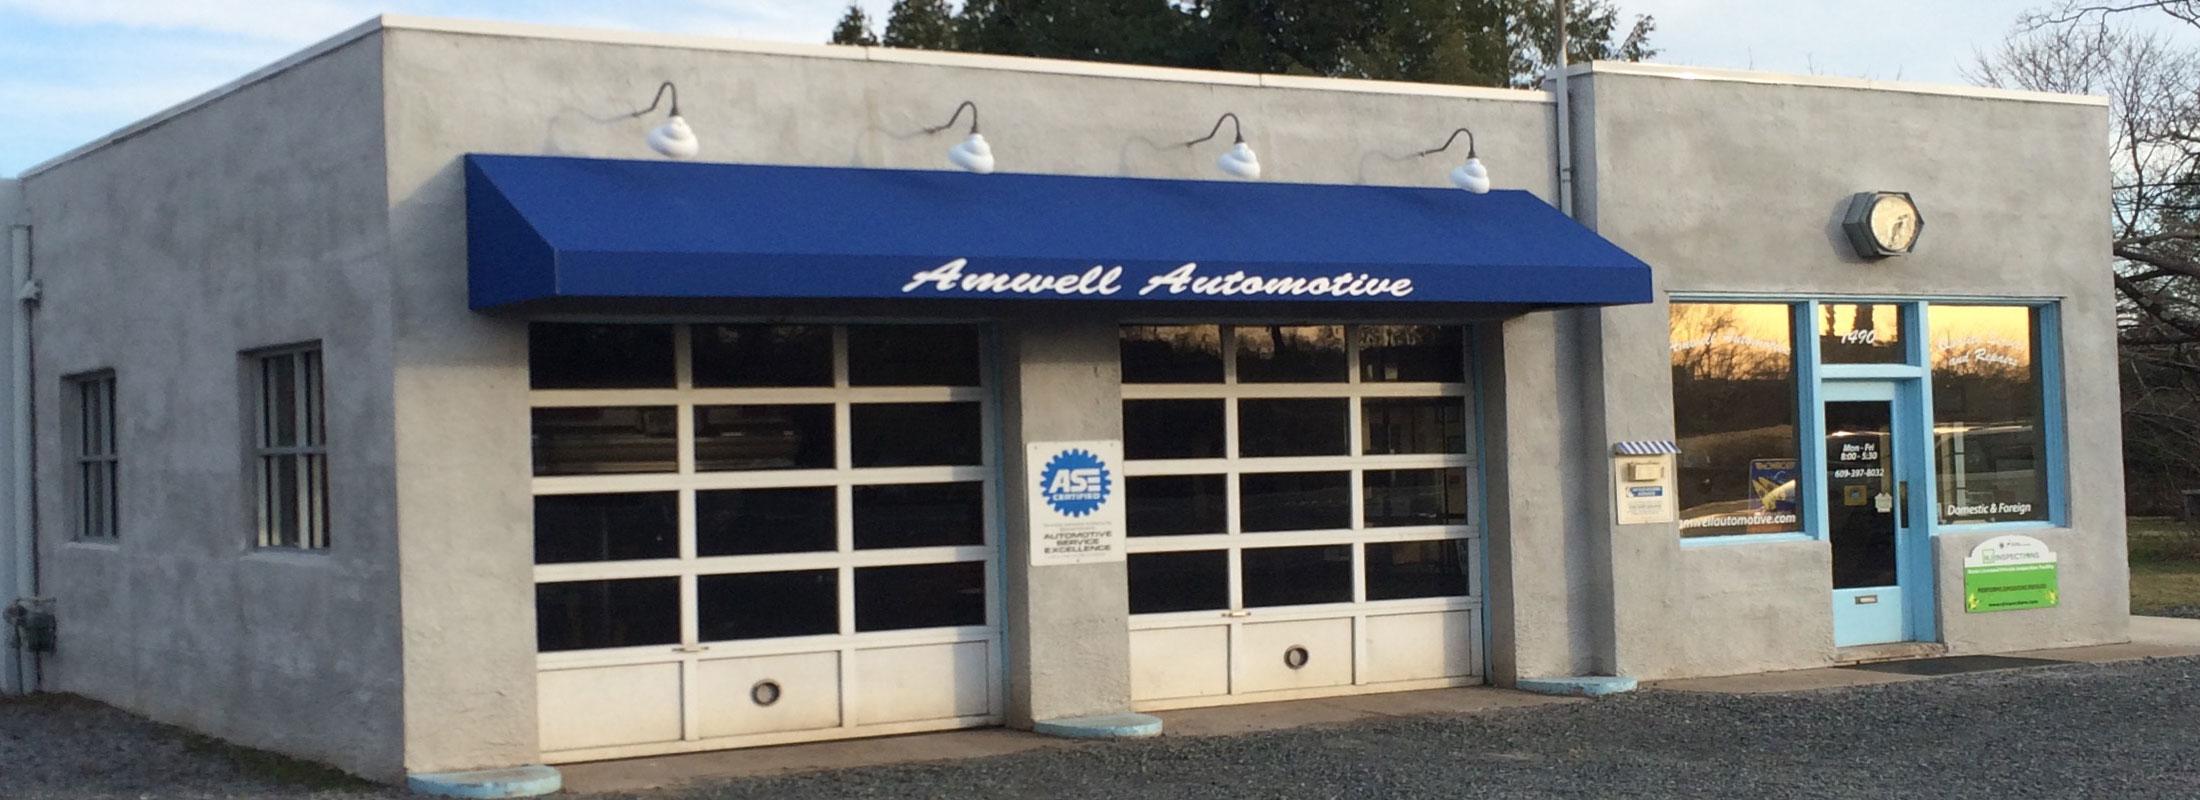 Amwell Automotive   Lambertville, NJ